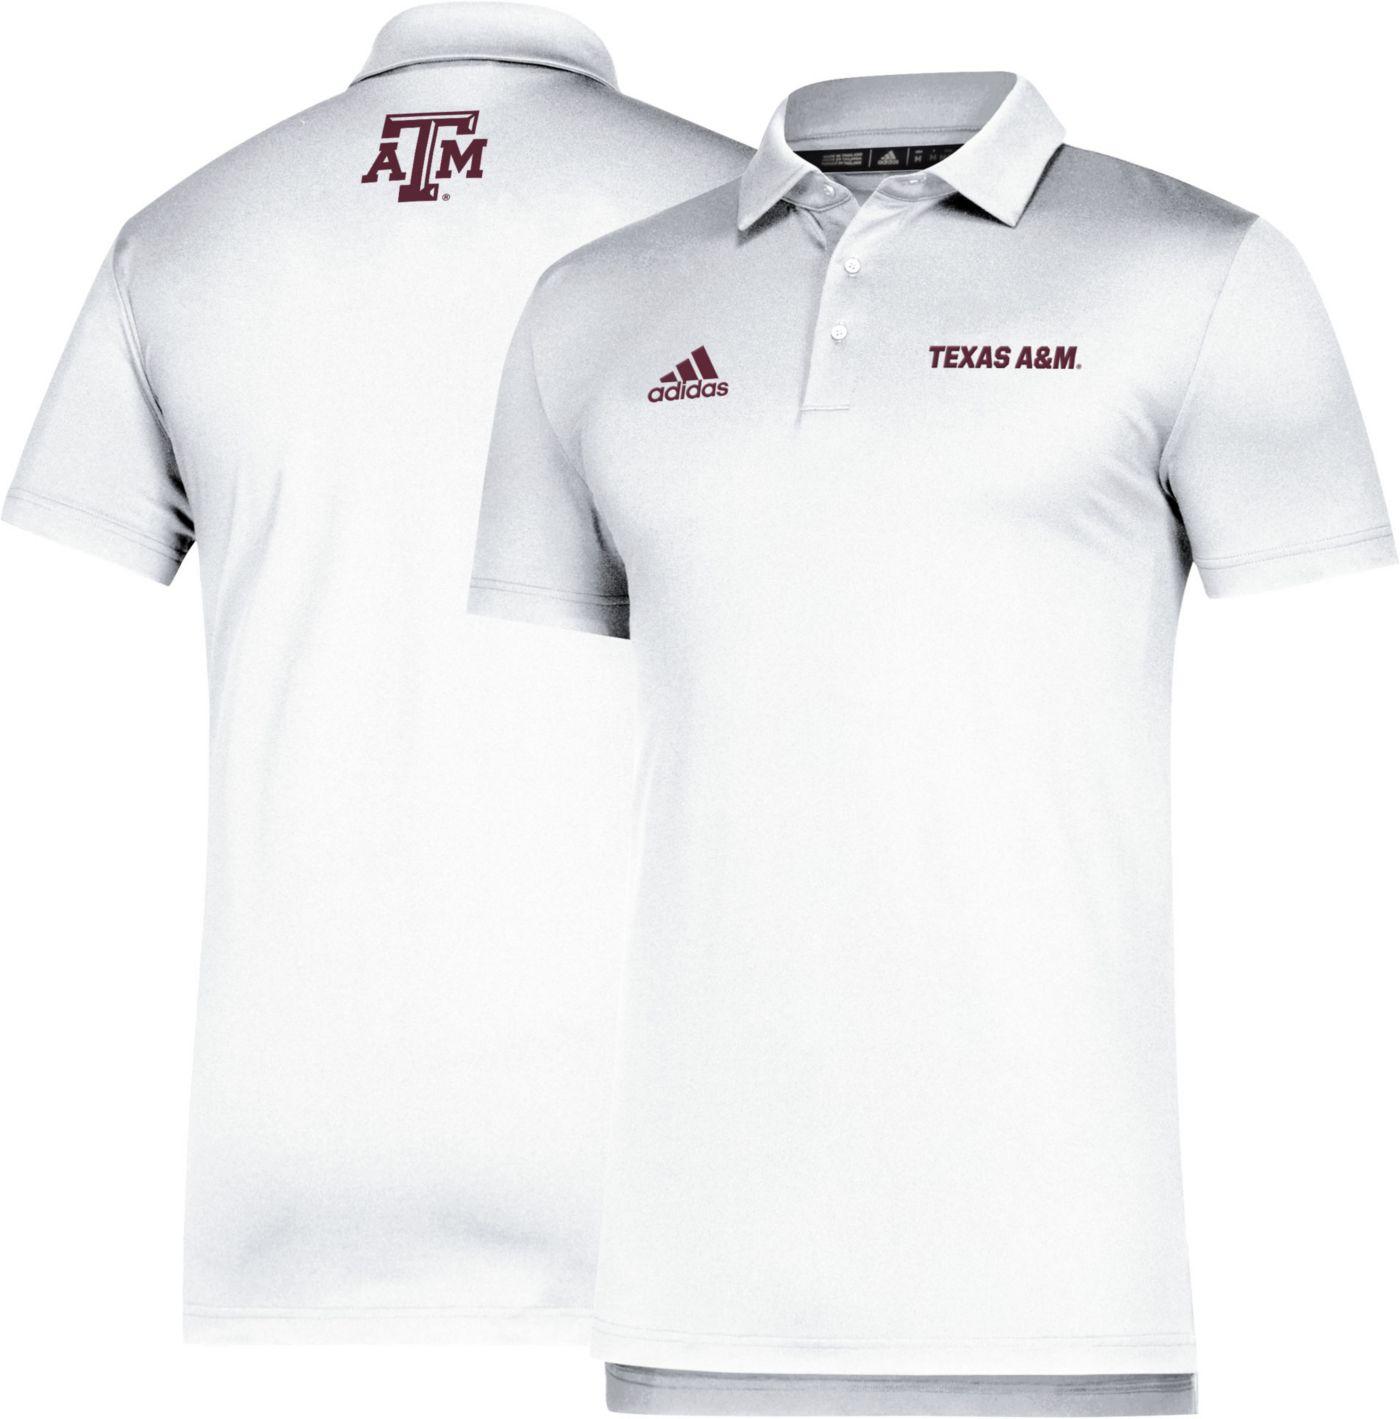 adidas Men's Texas A&M Aggies Game Mode Coordinator Sideline White Polo